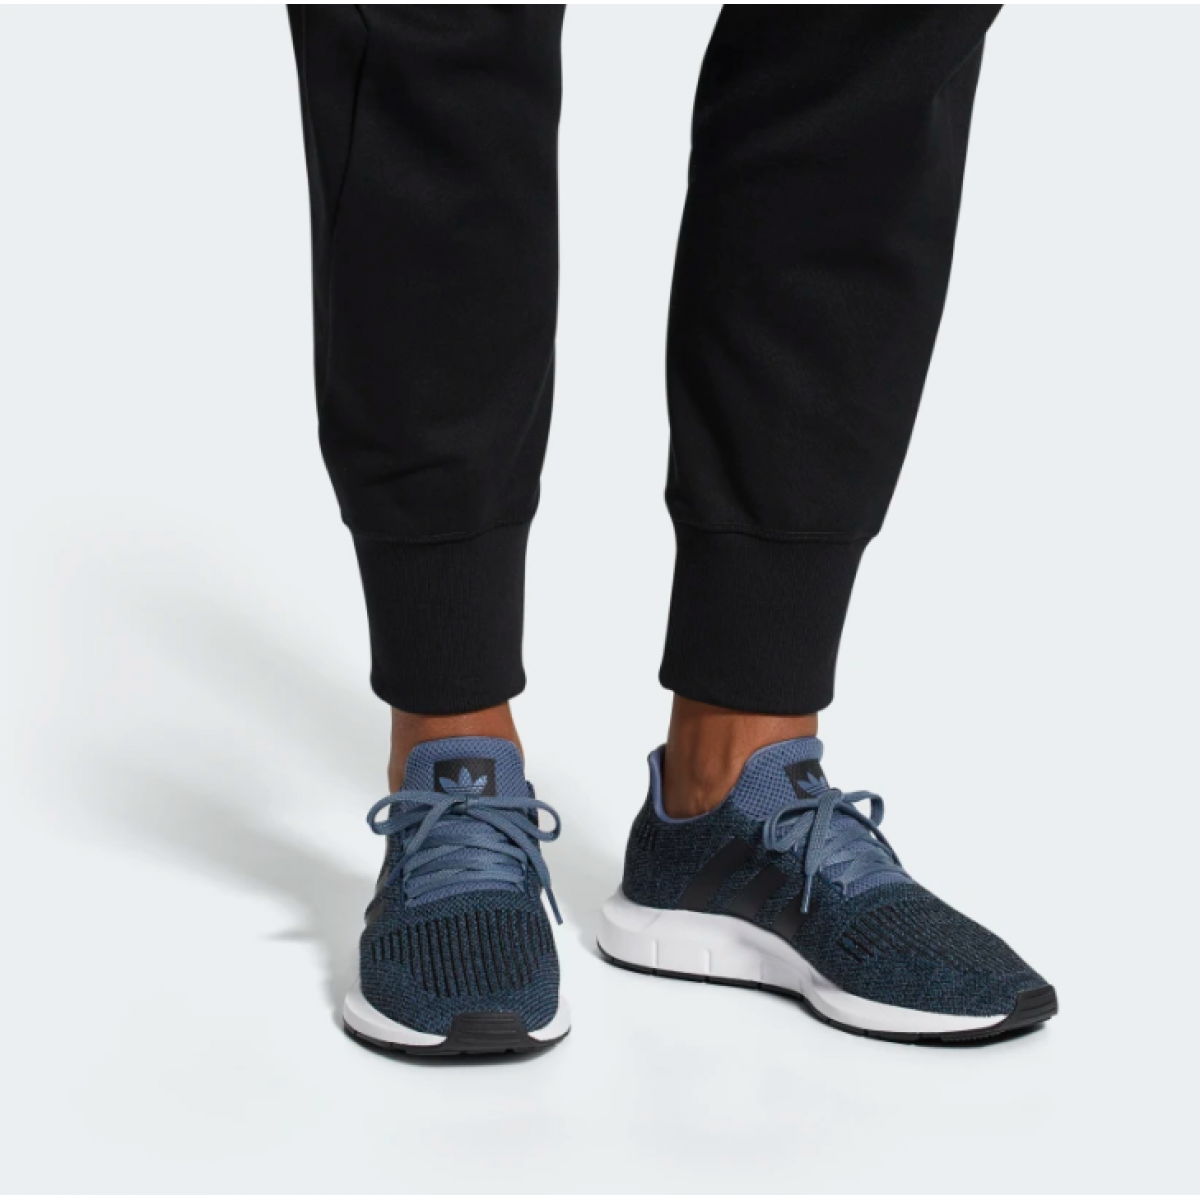 Adidas Men's Swift Run Shoes